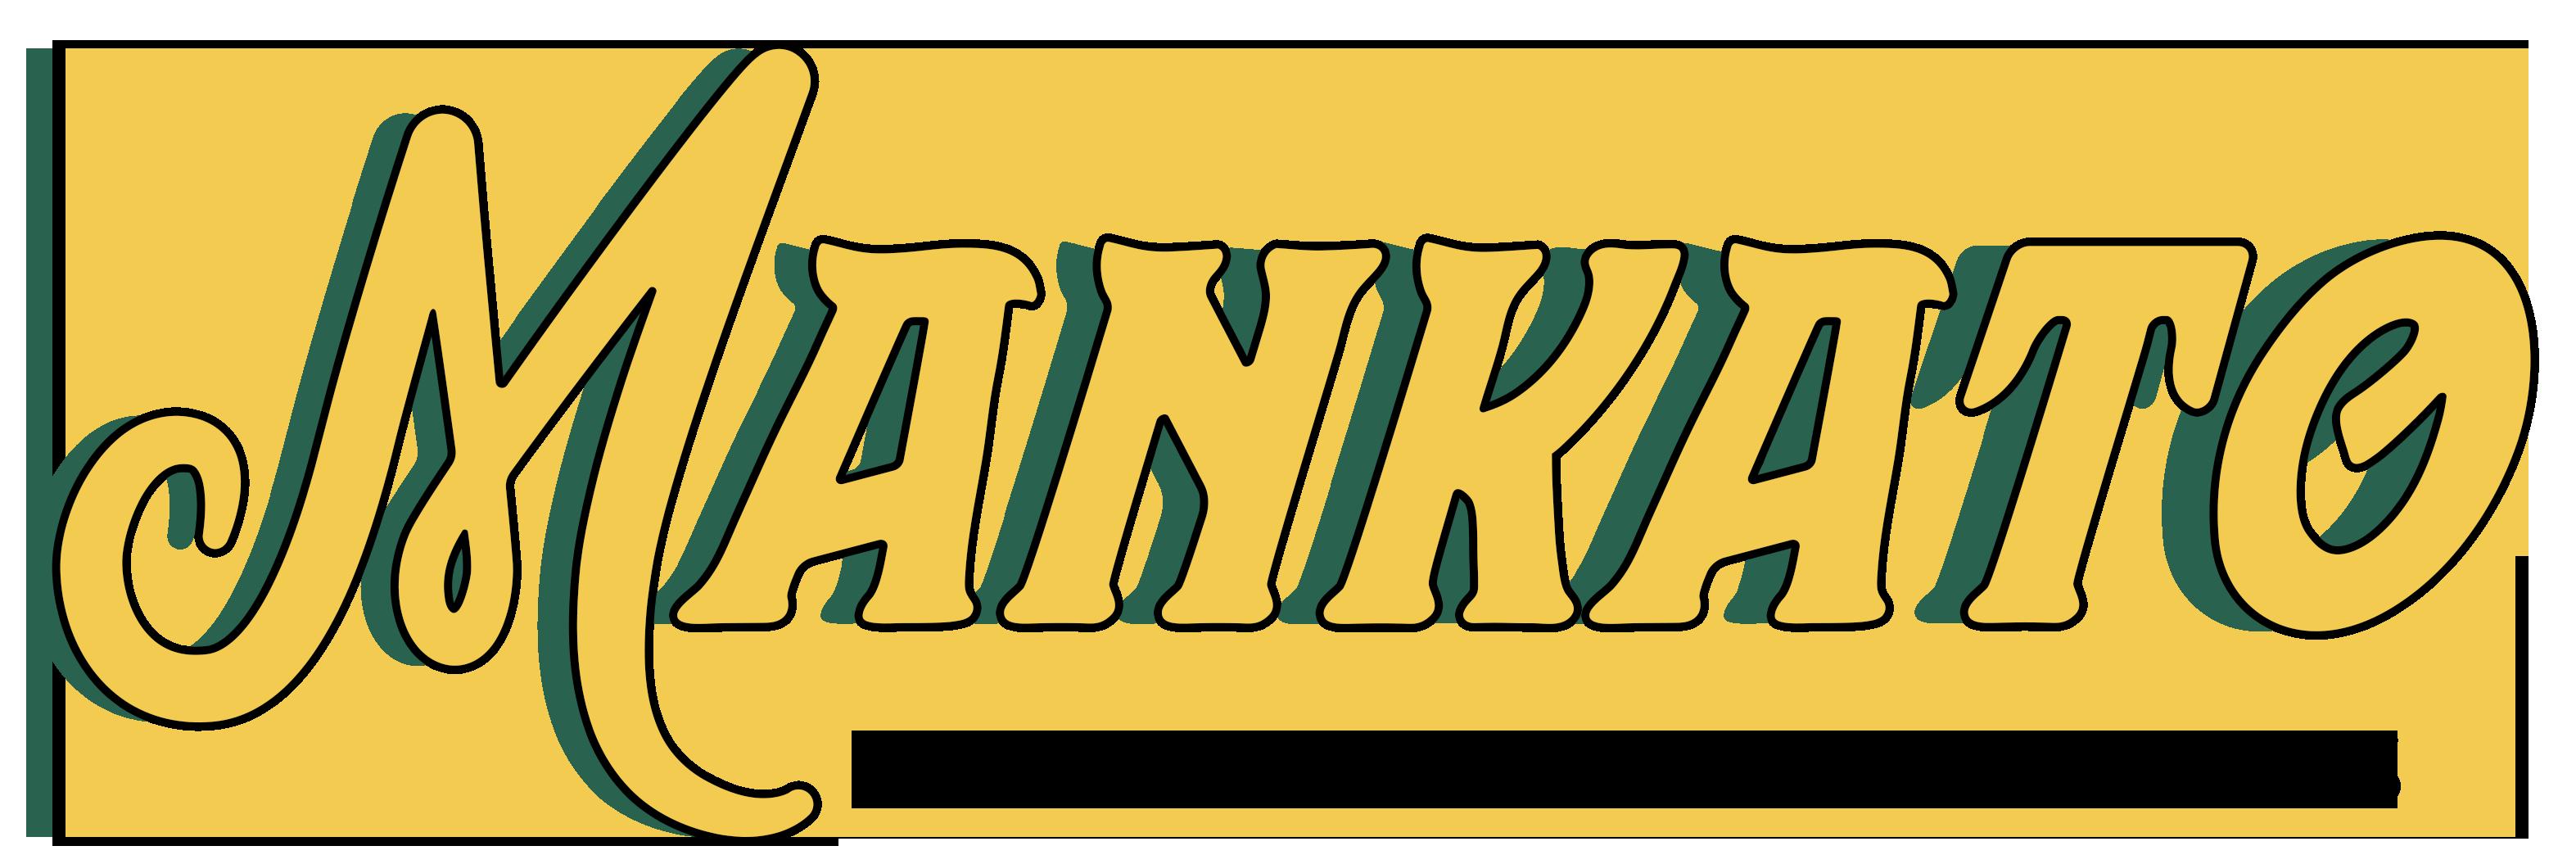 Mankato Tropical Guitars